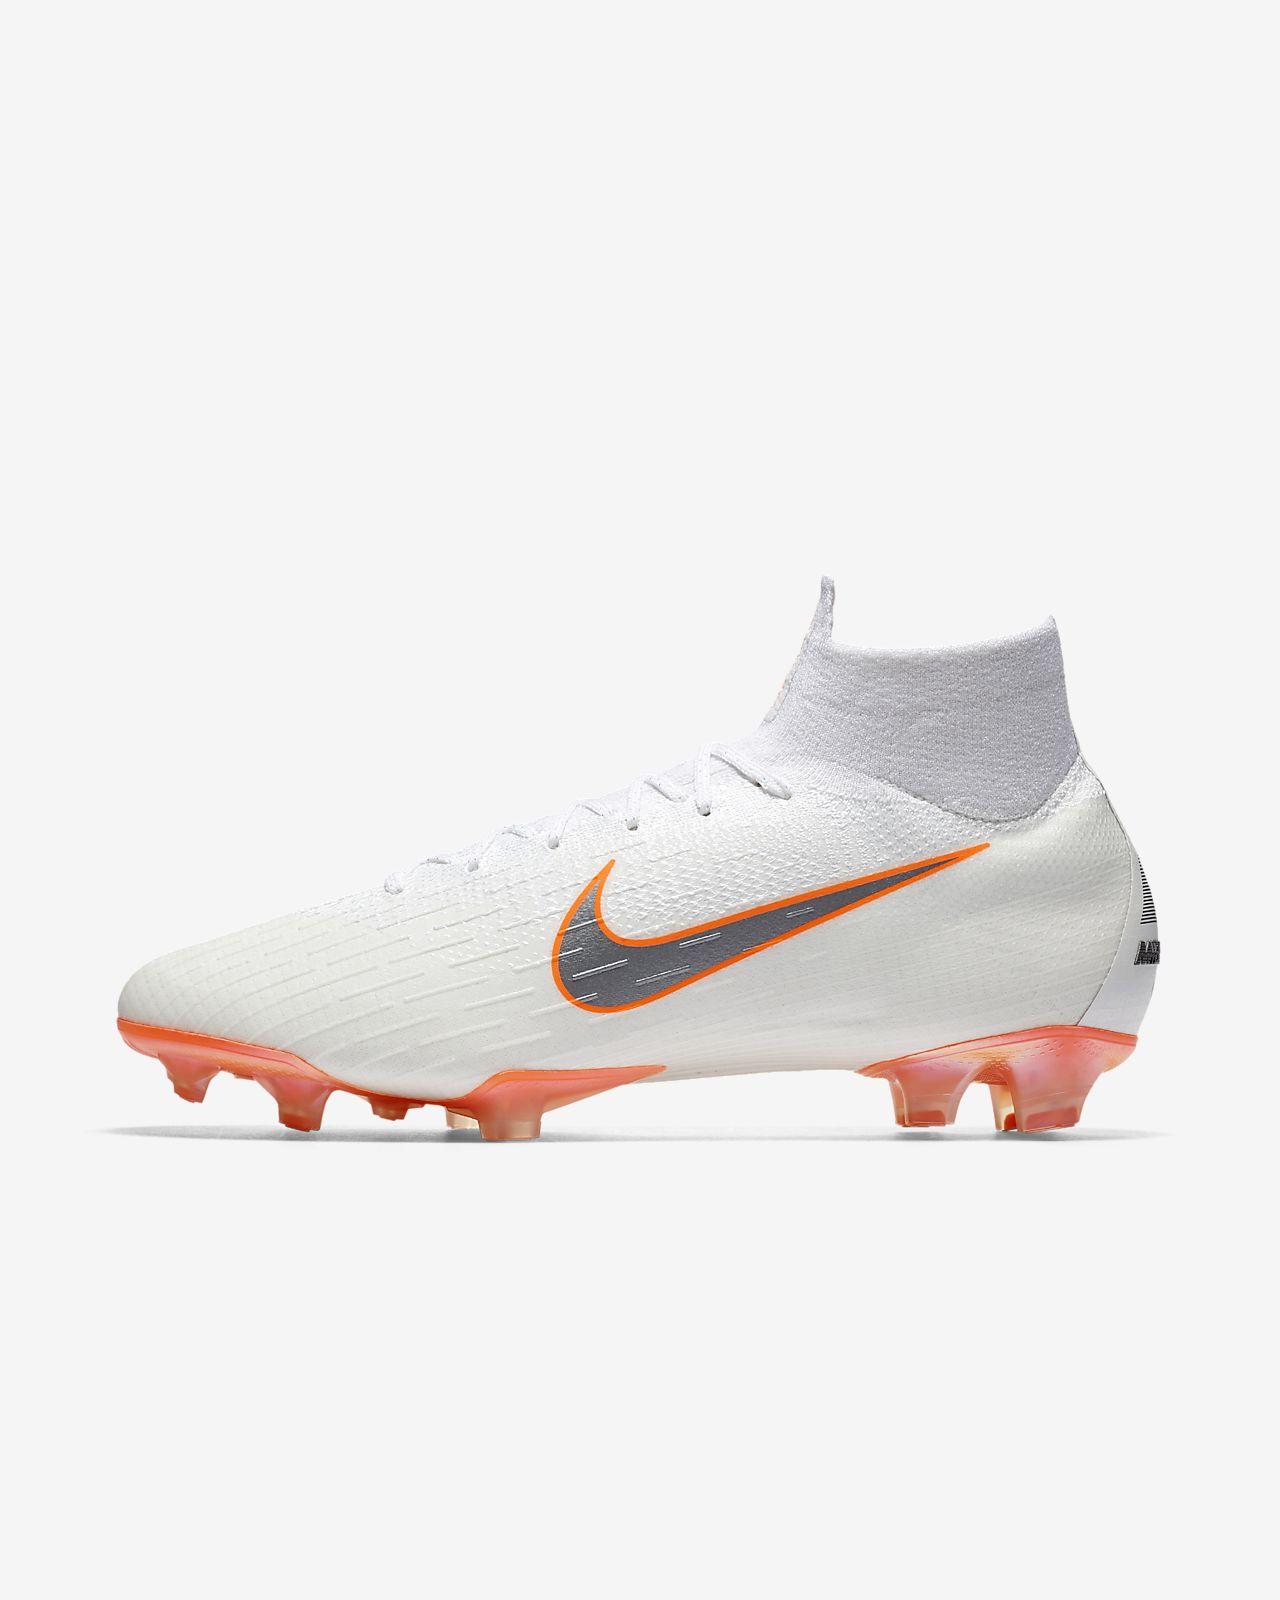 Scarpa da calcio per terreni duri Nike Mercurial Superfly 360 Elite Just Do  It